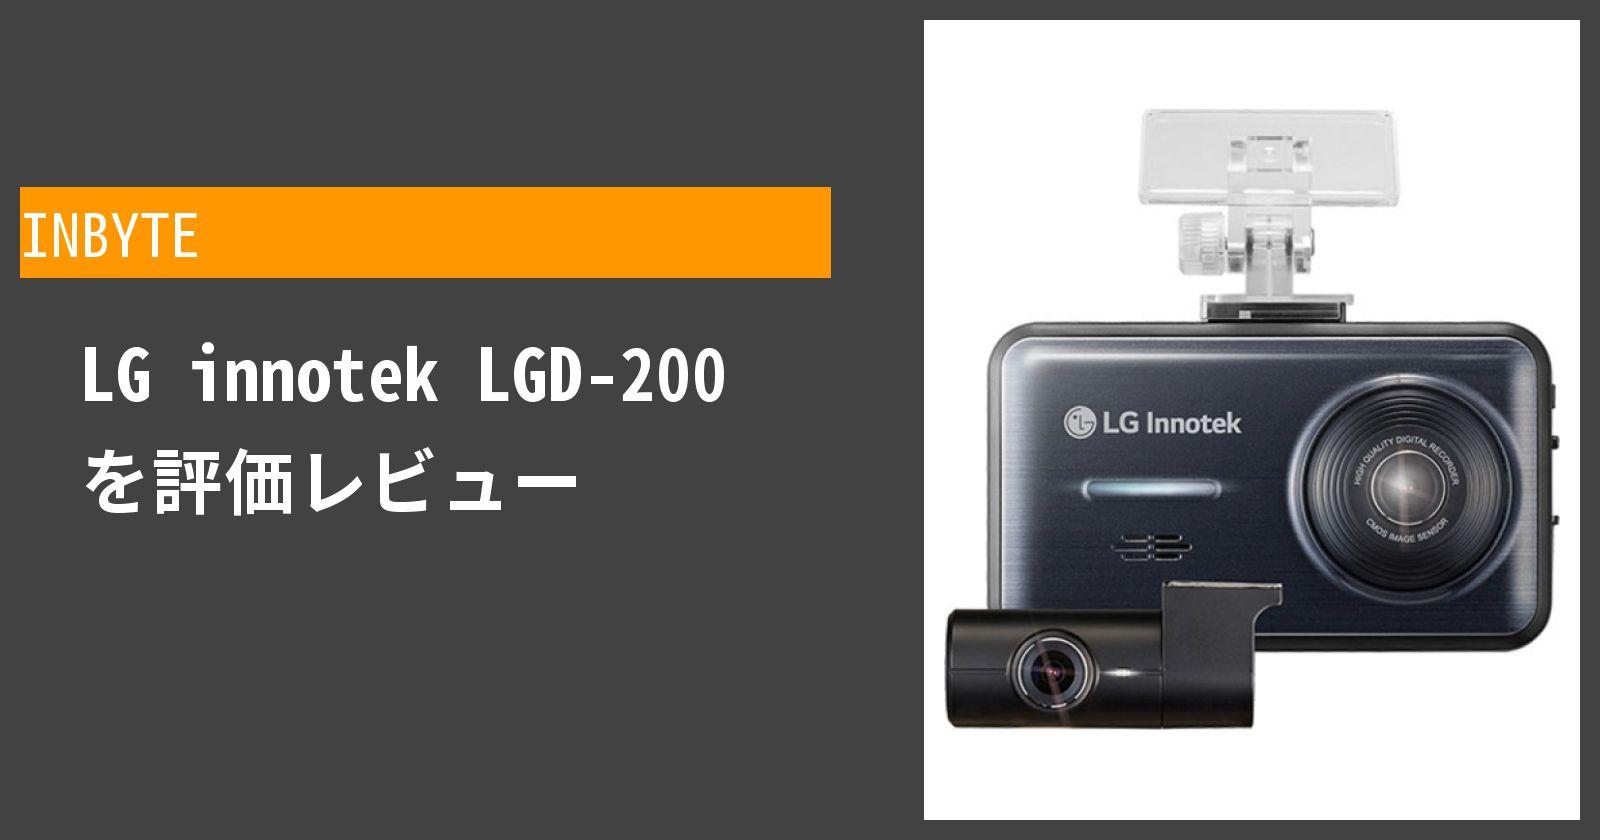 LG innotek LGD-200を徹底評価